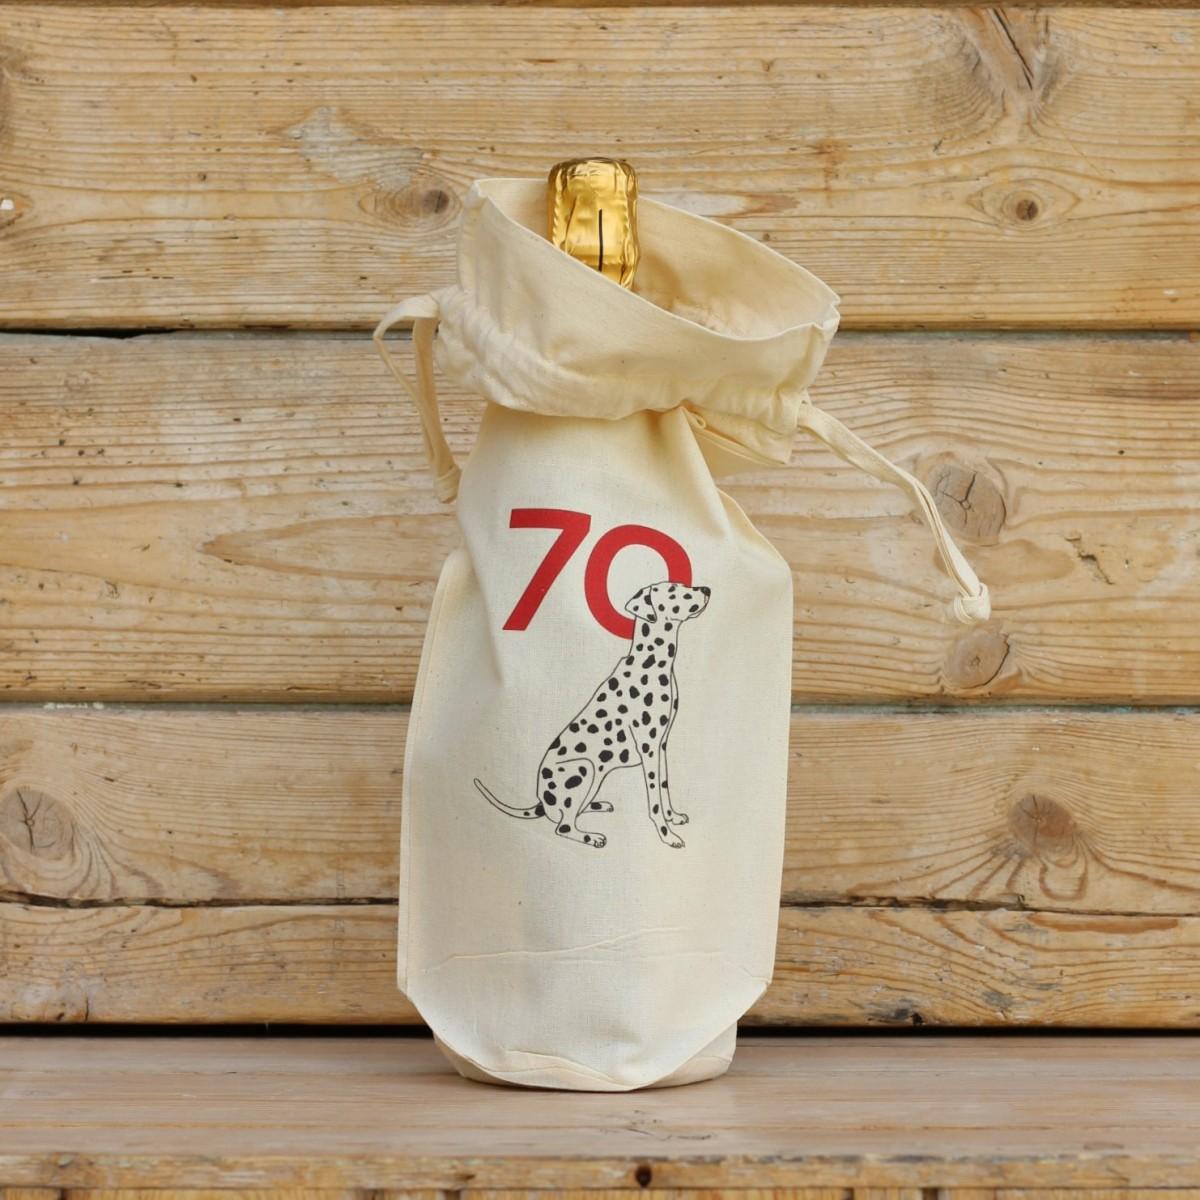 Age Seventy Cotton Bottle Gift Bag